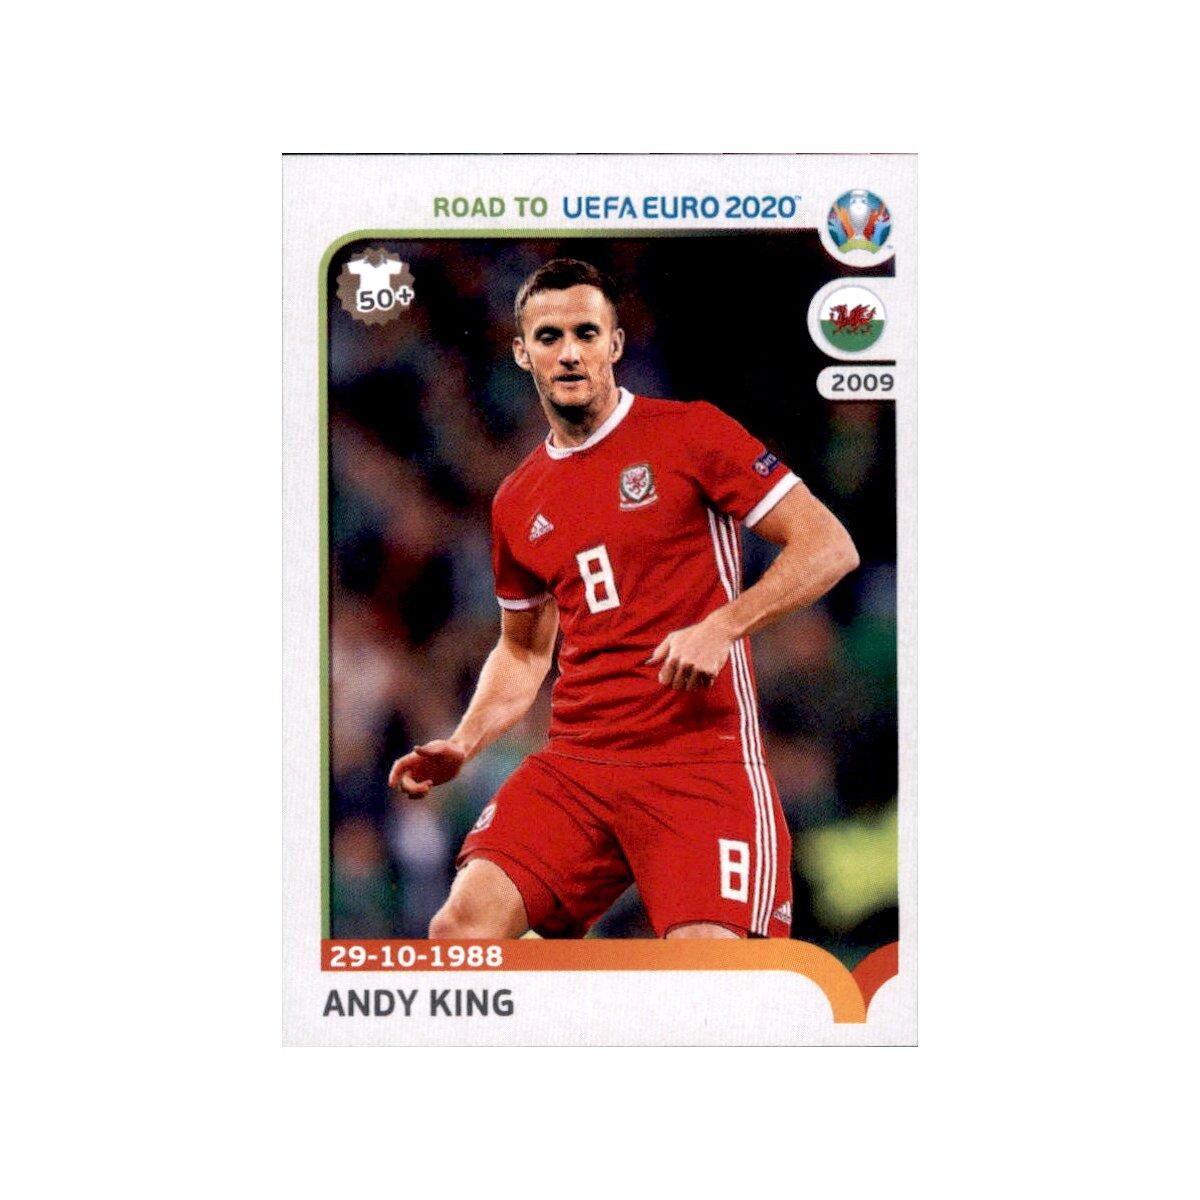 Sticker 434 Gareth Bale Road to EM 2020 Wales